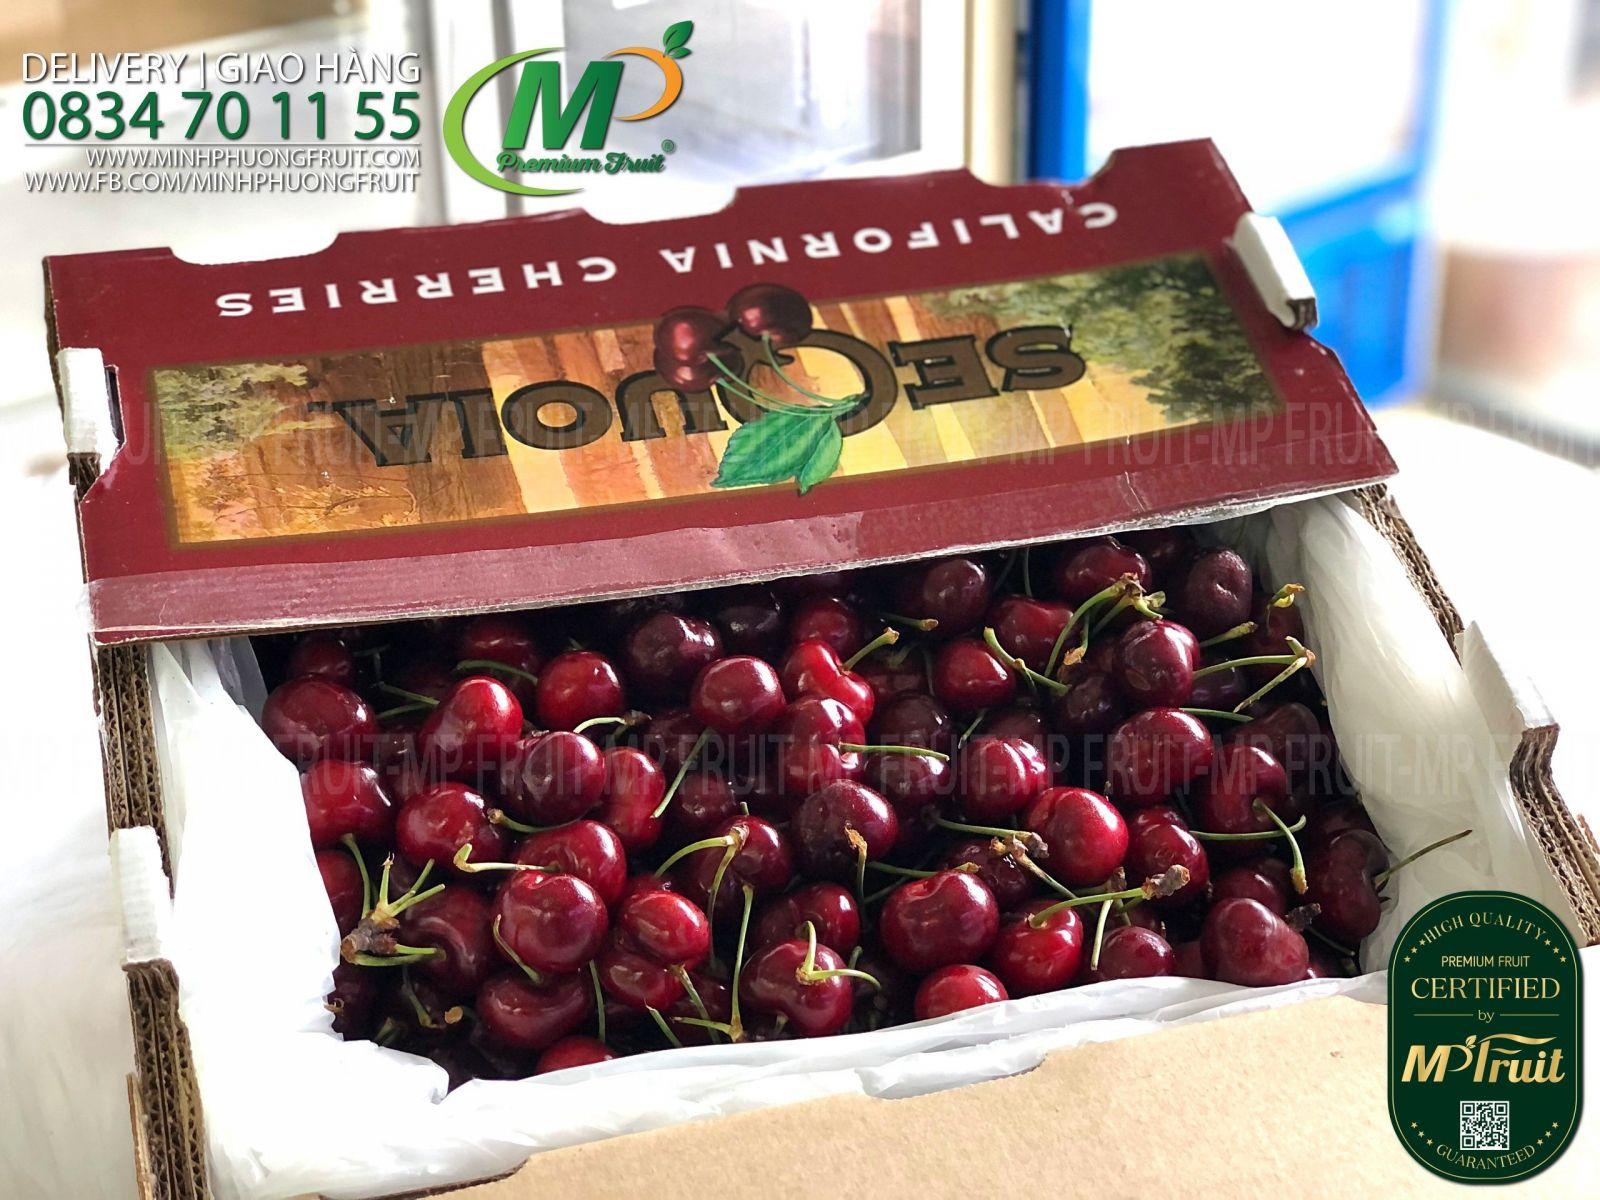 Cherry Đỏ Mỹ Size 9 | Sequoia tại MP Fruits